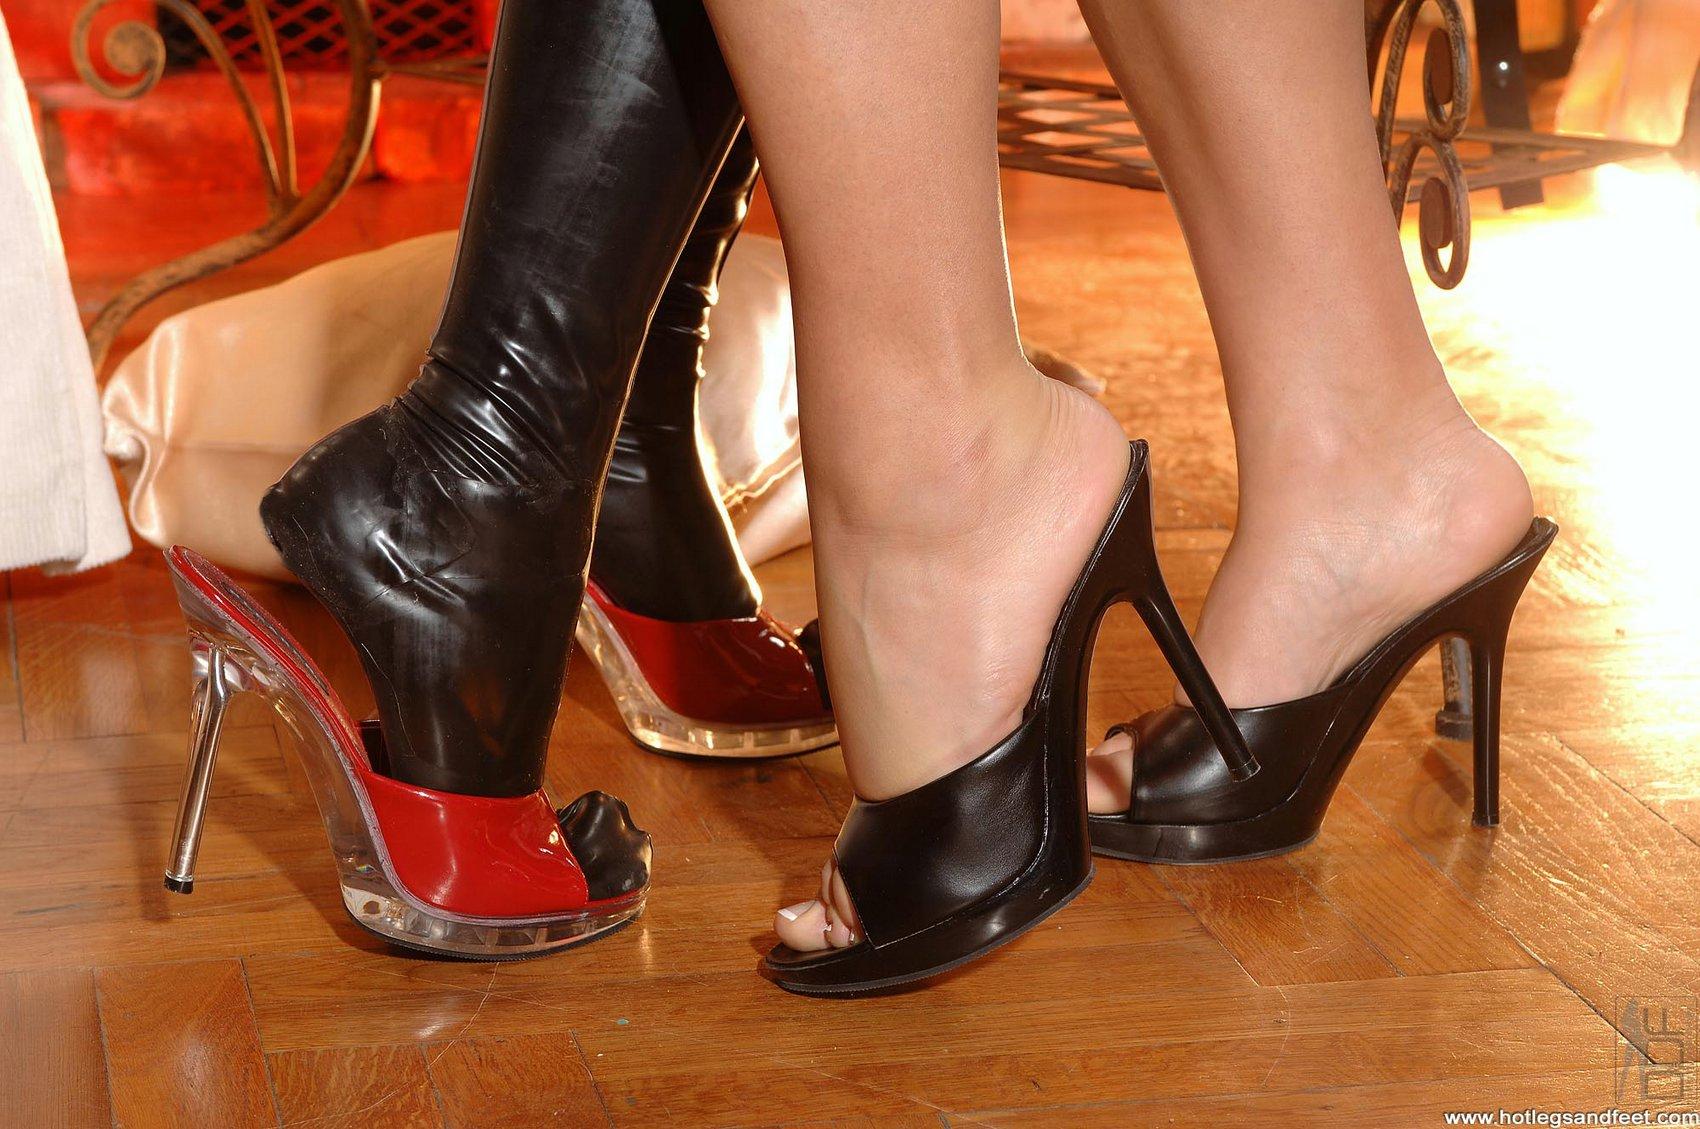 Porn feet strip images 46